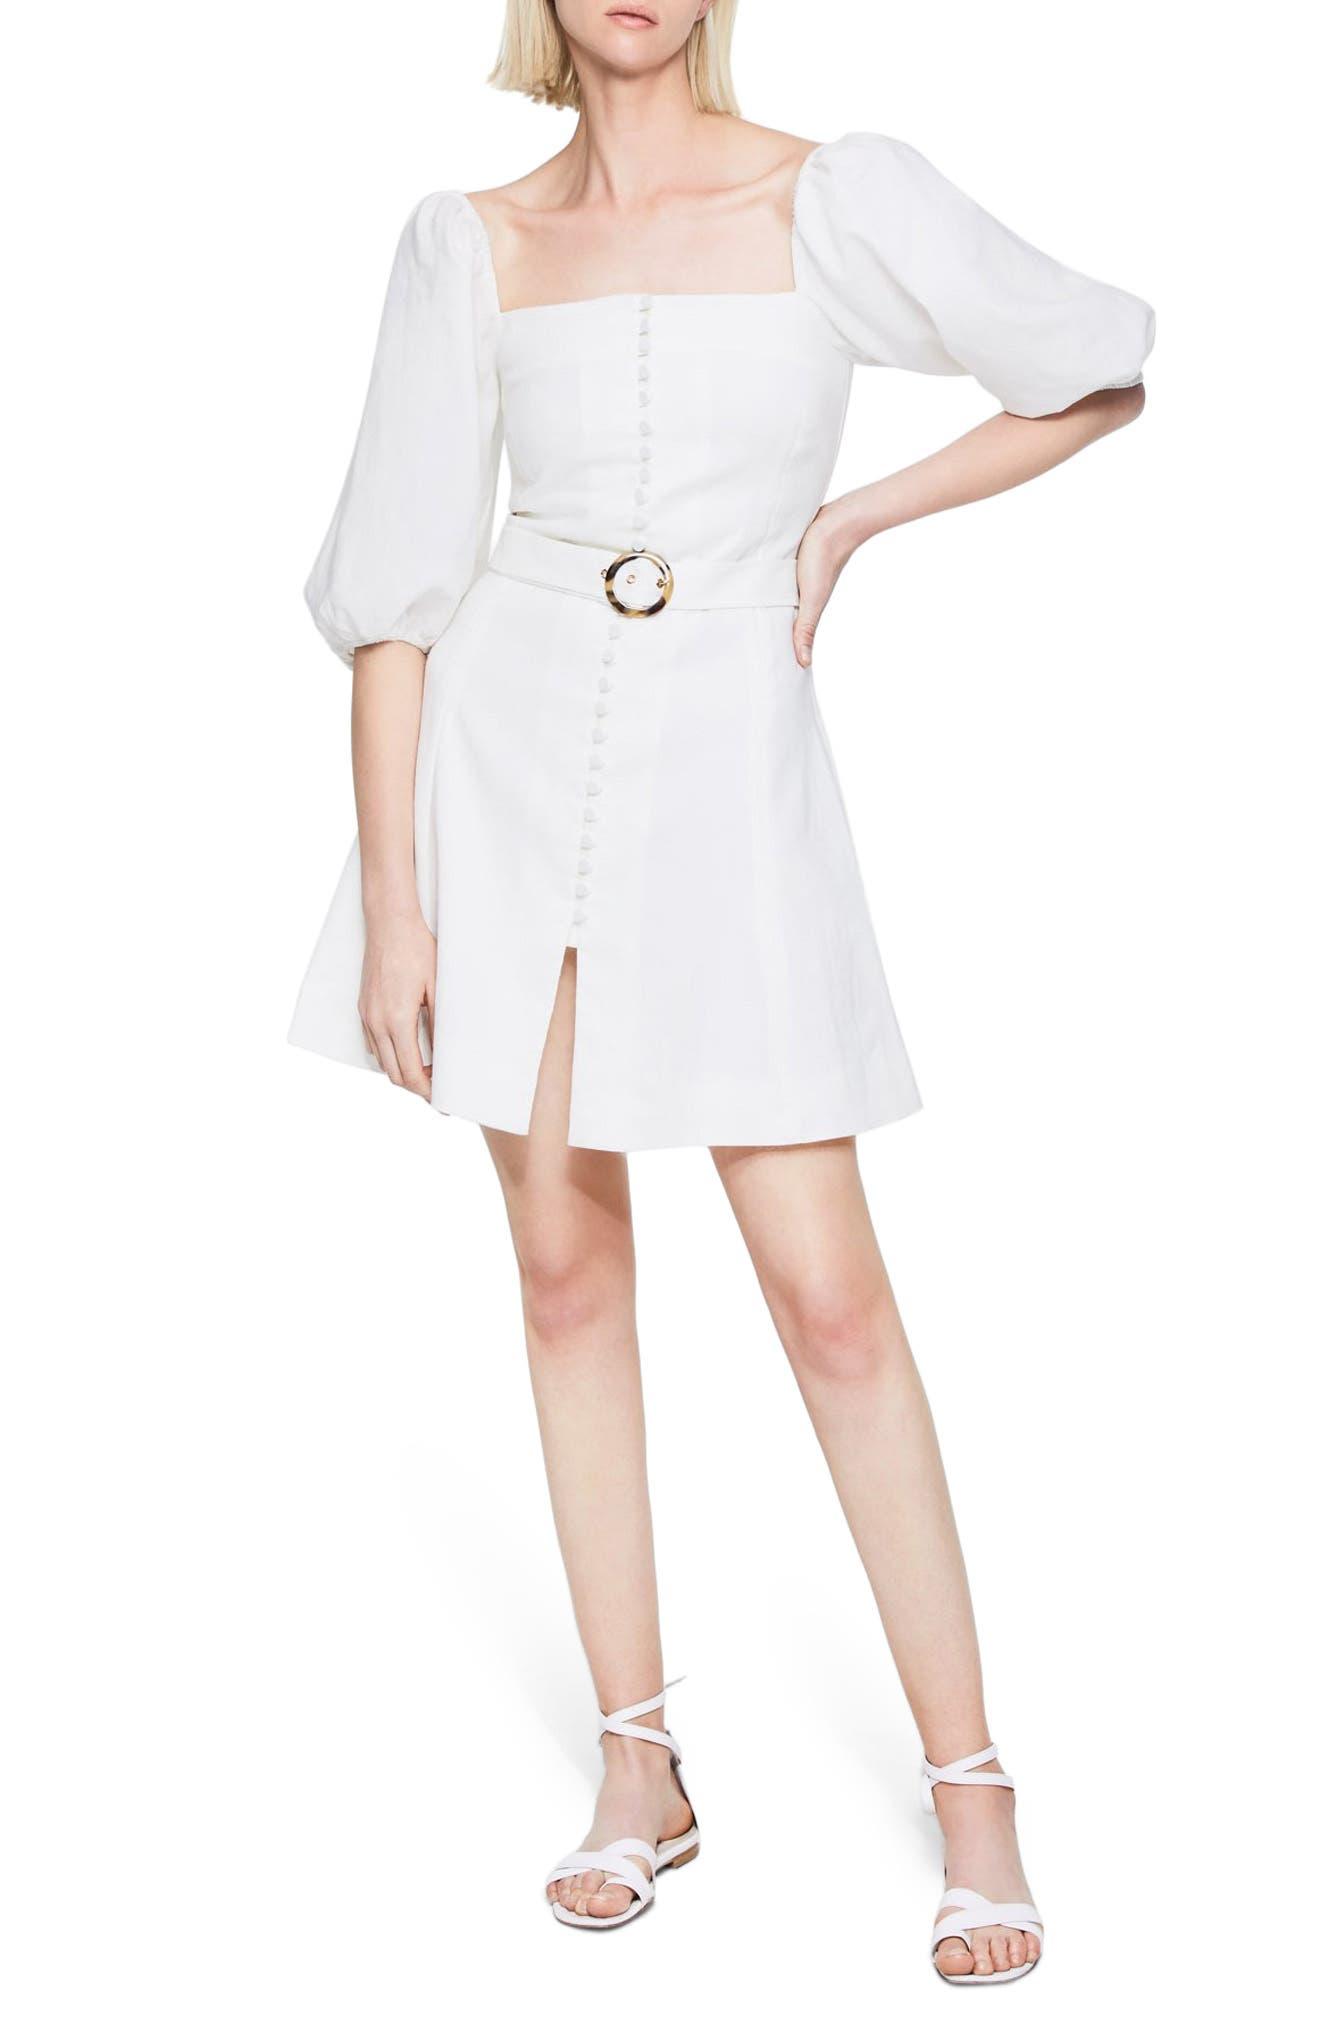 Jonathan Simkhai Emery Puff Sleeve Linen Blend Dress | Nordstrom